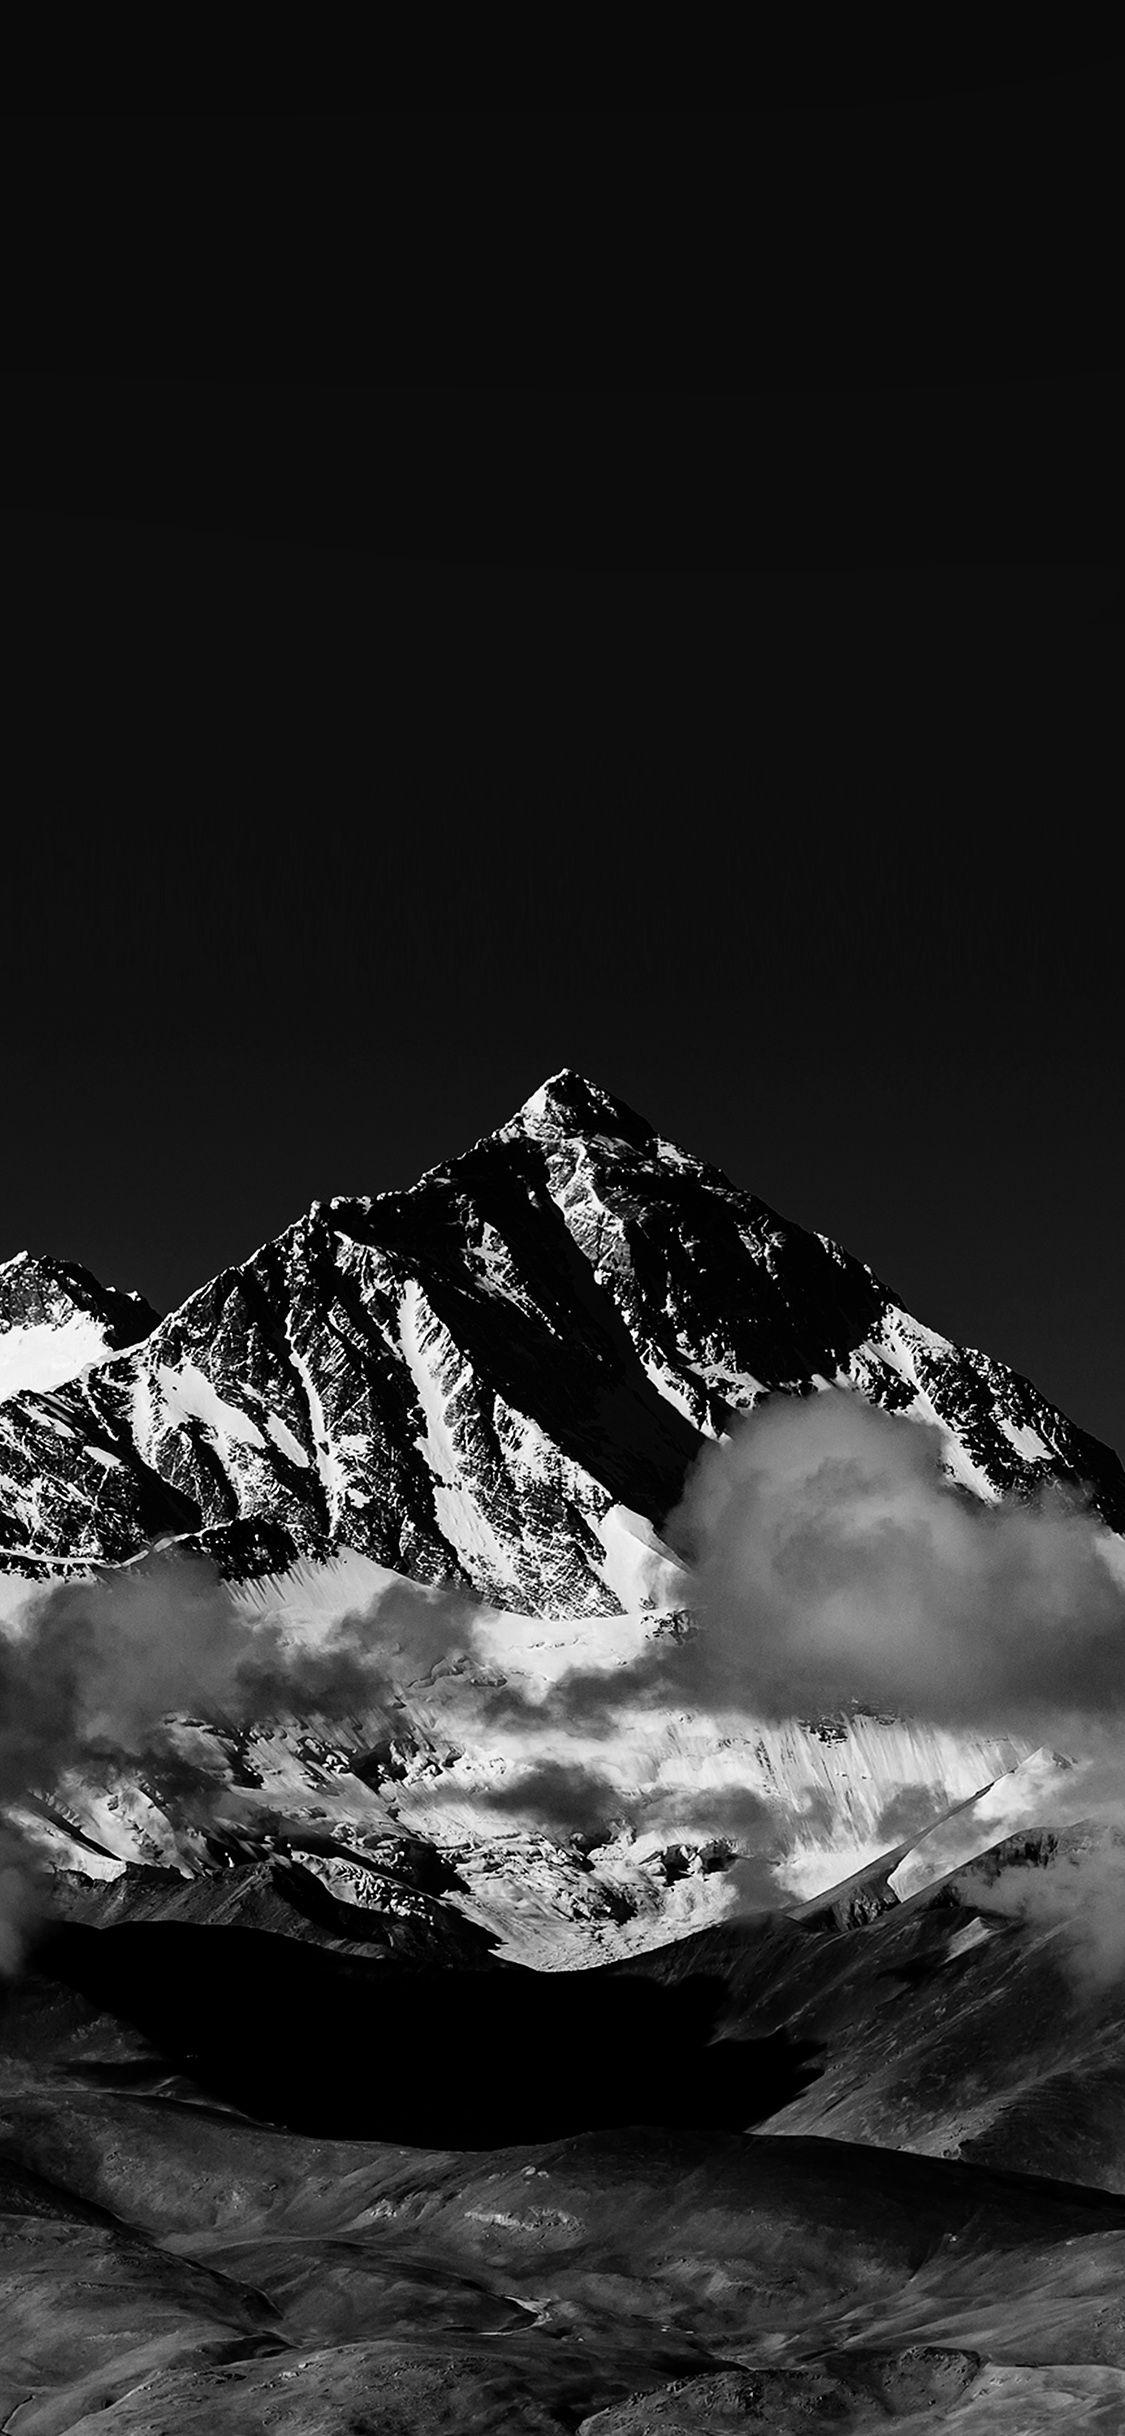 Iphonex Wallpaper Mr57 Snow Solo Mountain High Nature Dark Bw